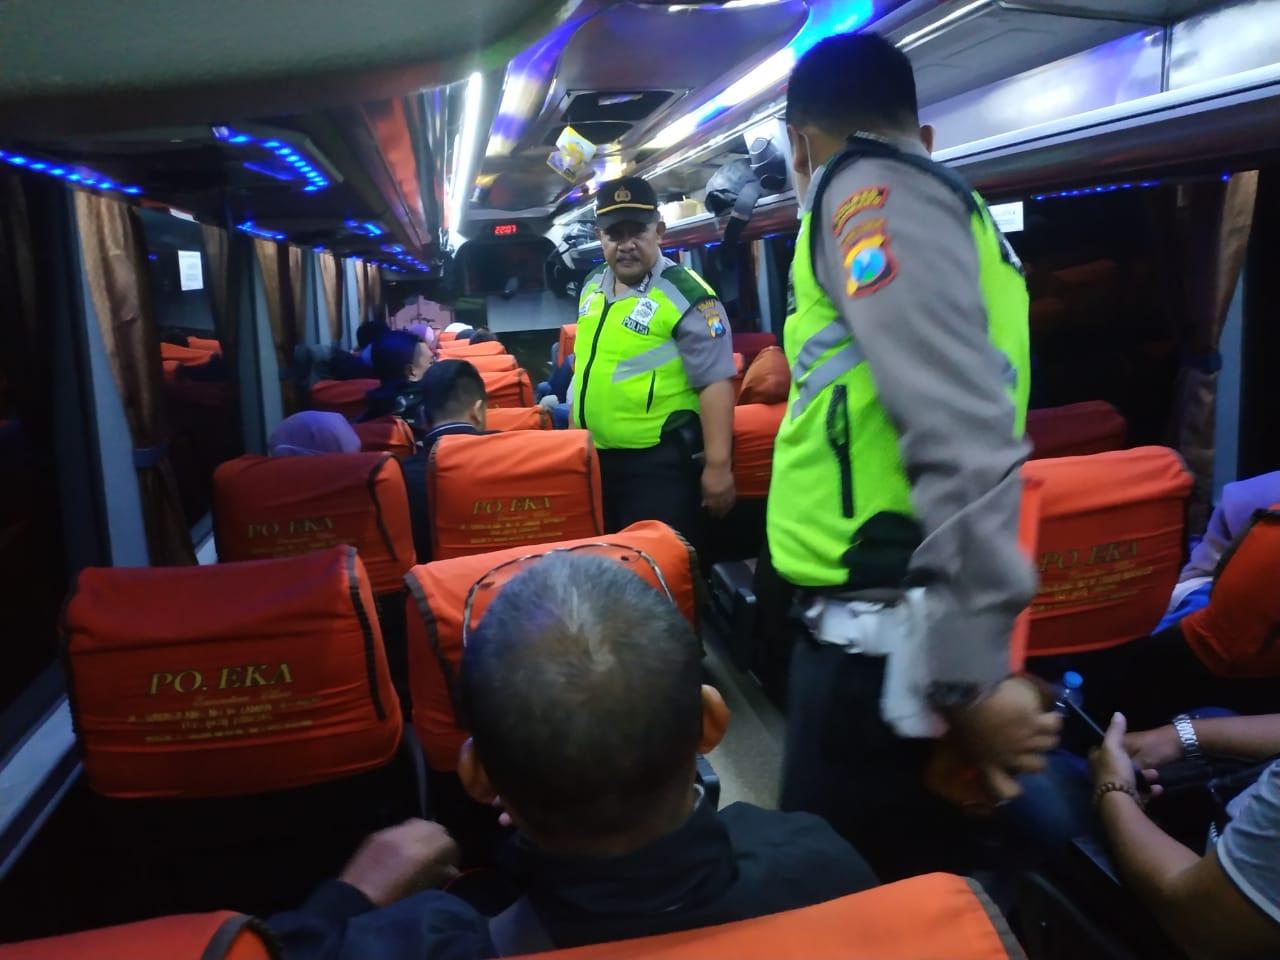 Sejumlah anggota Polres Jombang saat melakukan pemeriksaan kepada para penumpang bus. (Istimewa)